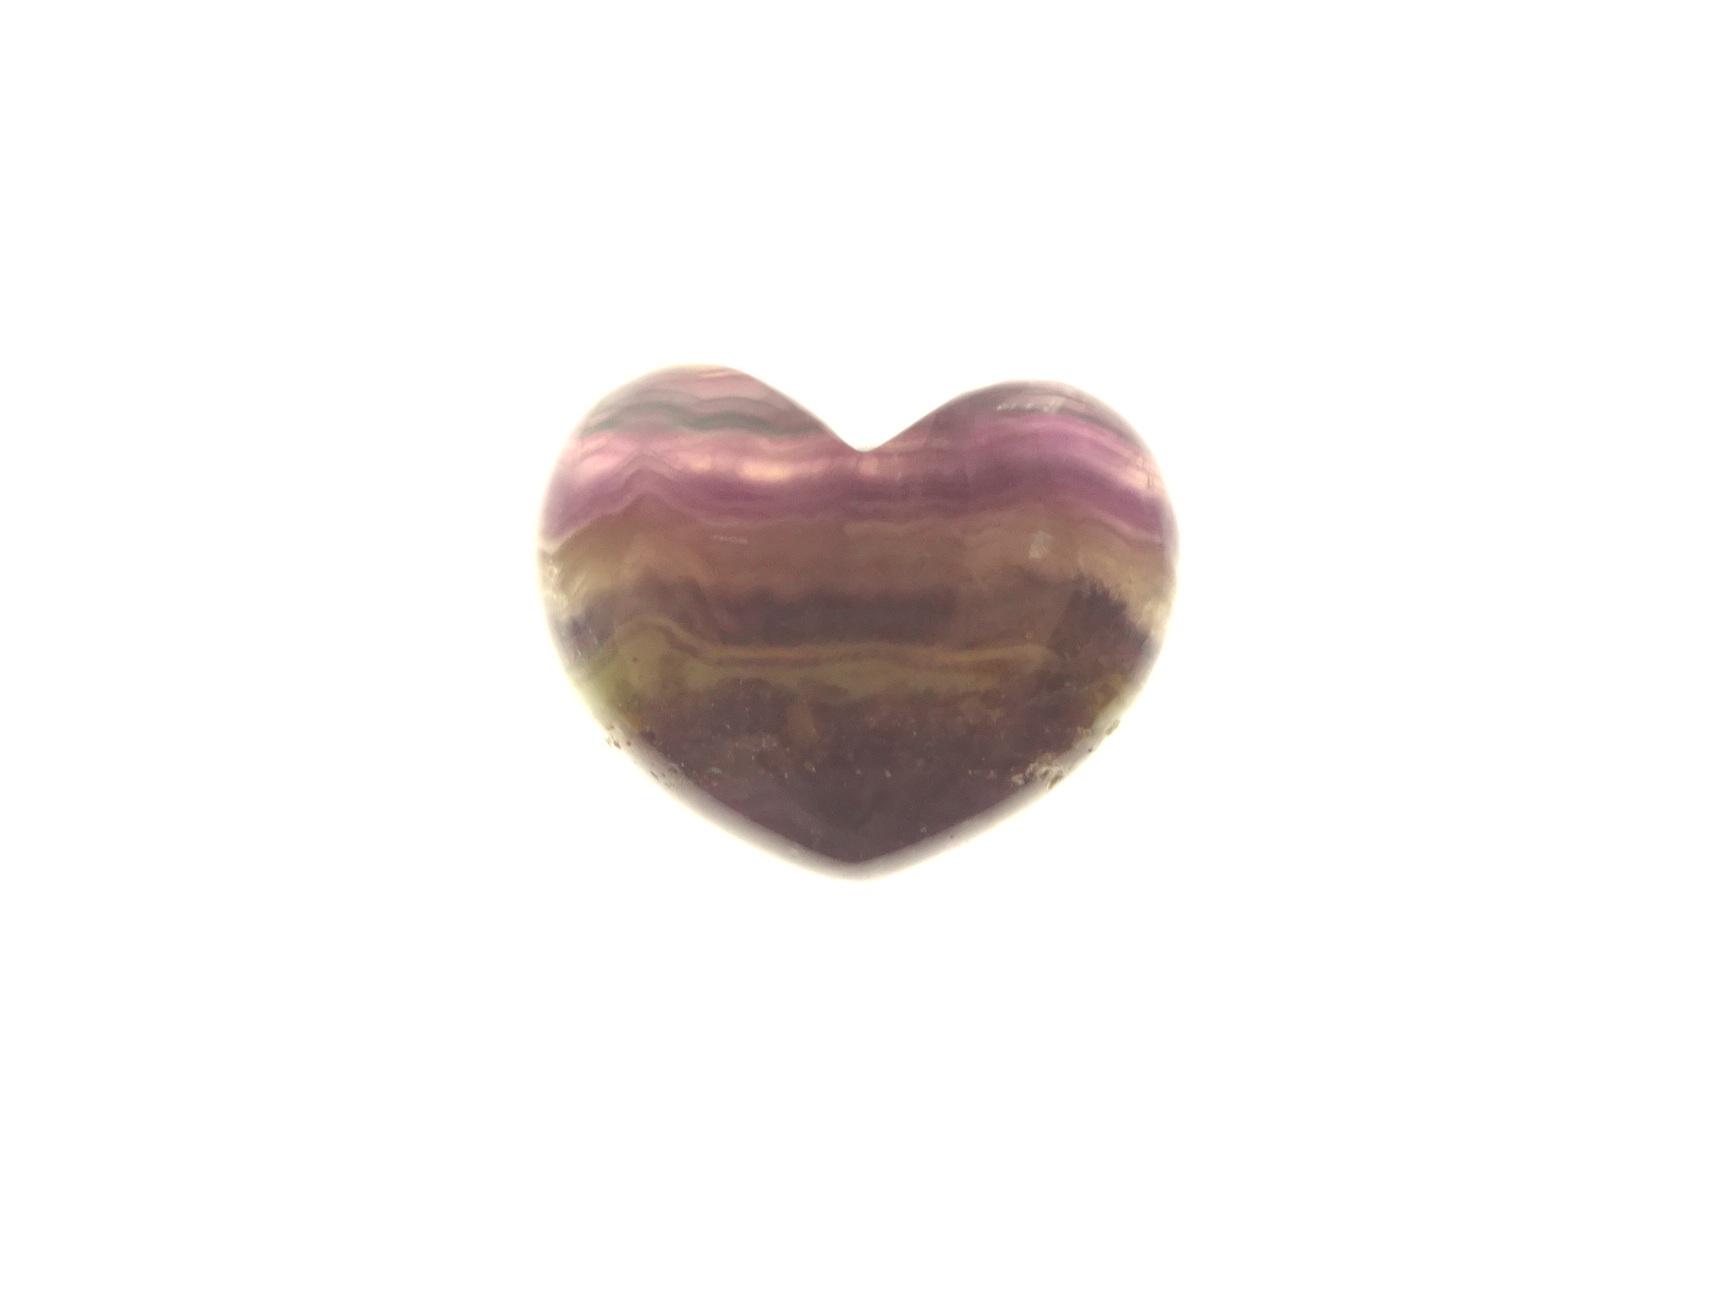 Fluorite Gemstone Heart Specimen